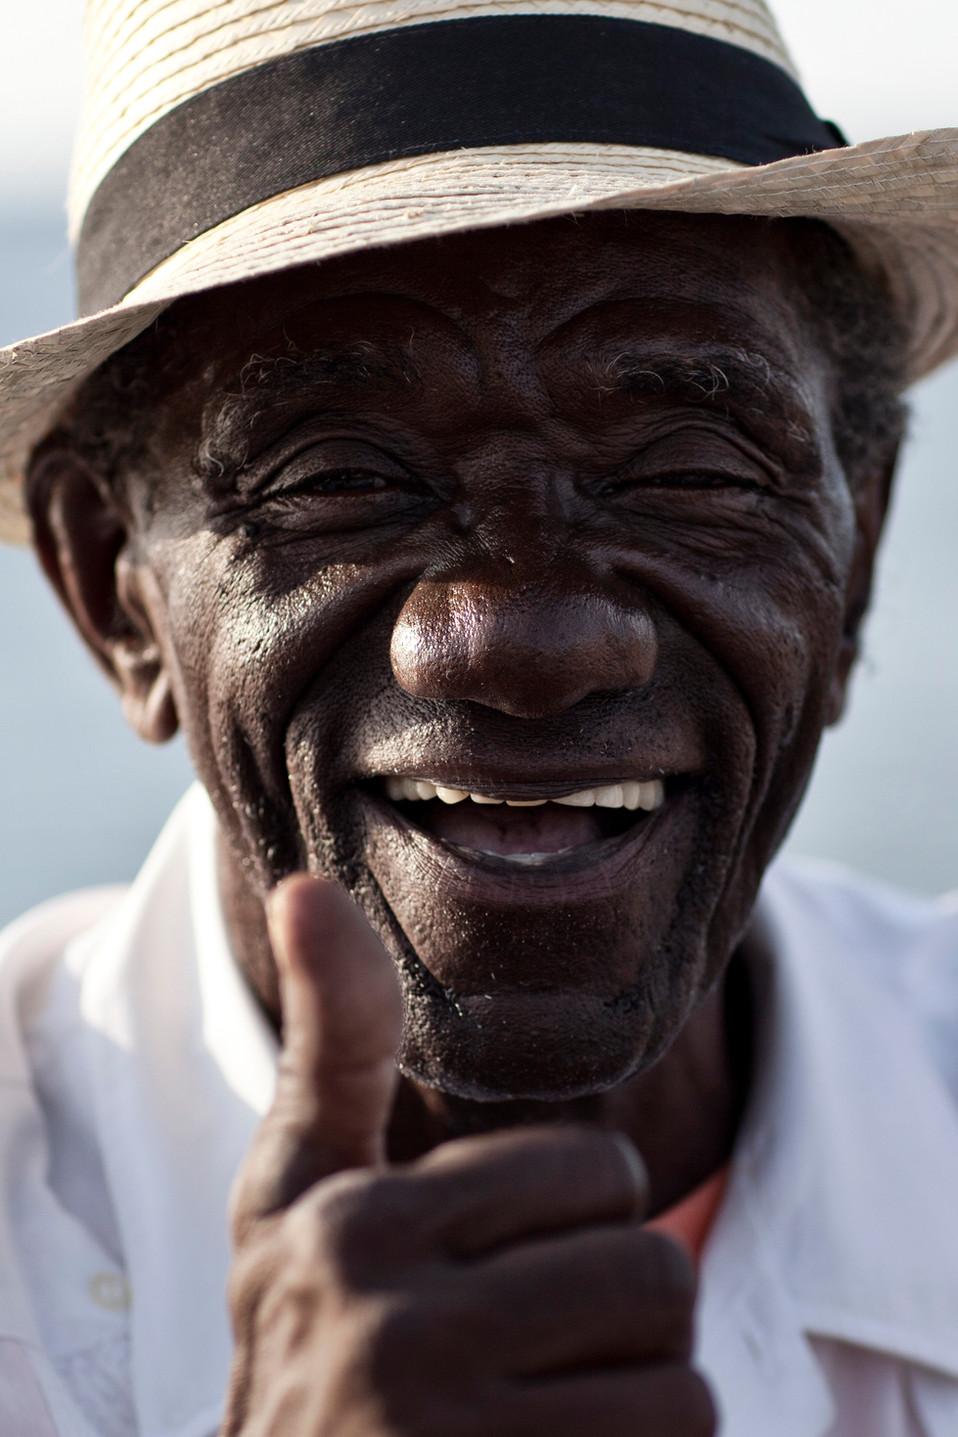 Rodrigo Vega Fotografo _ Cuba 1 foto.jpg